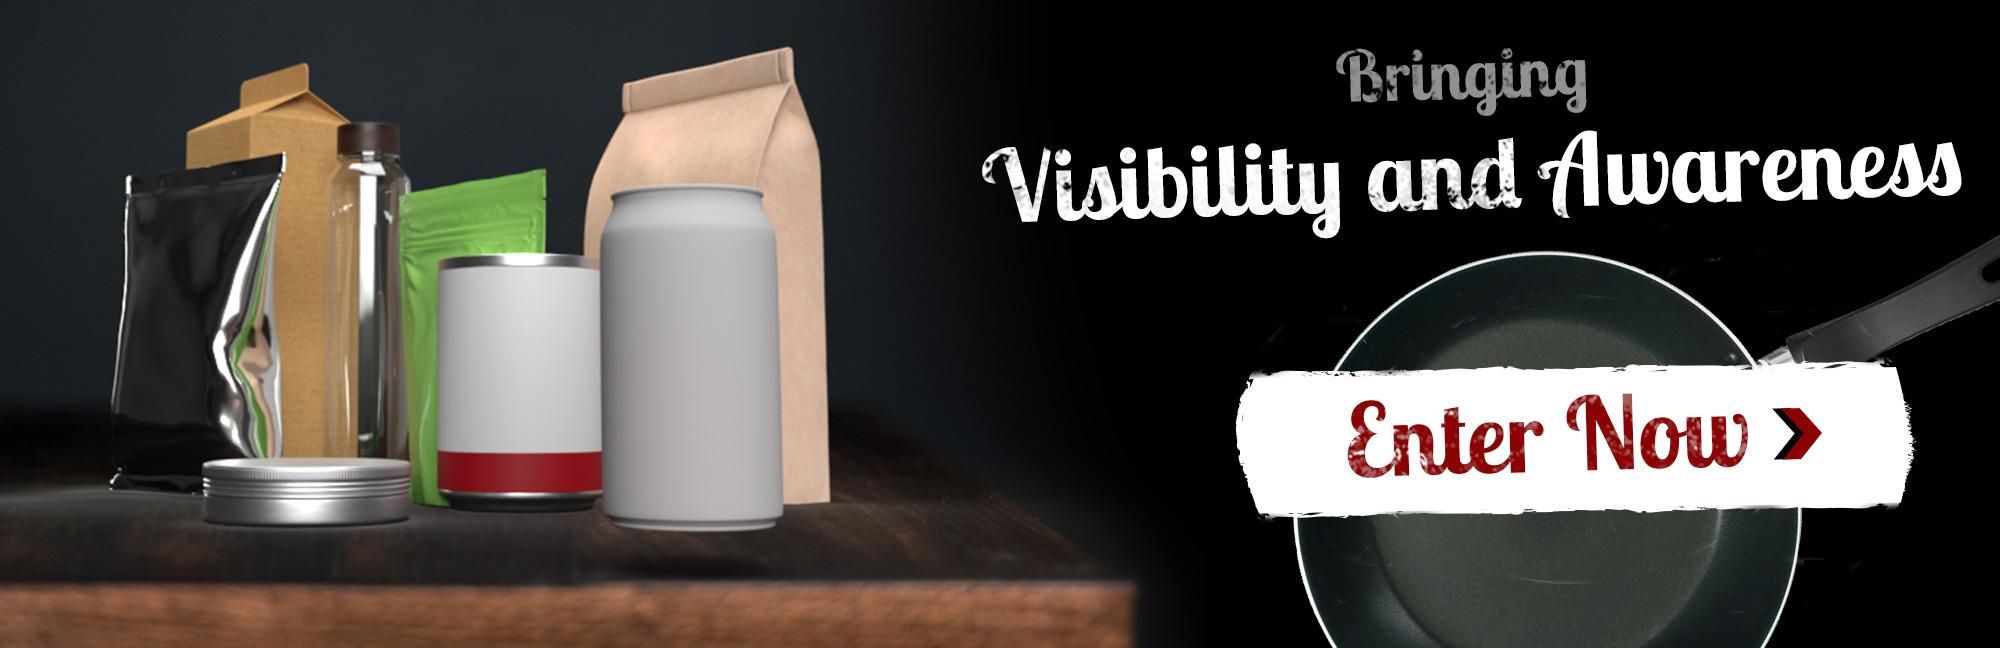 Bringing Visibility and Awareness